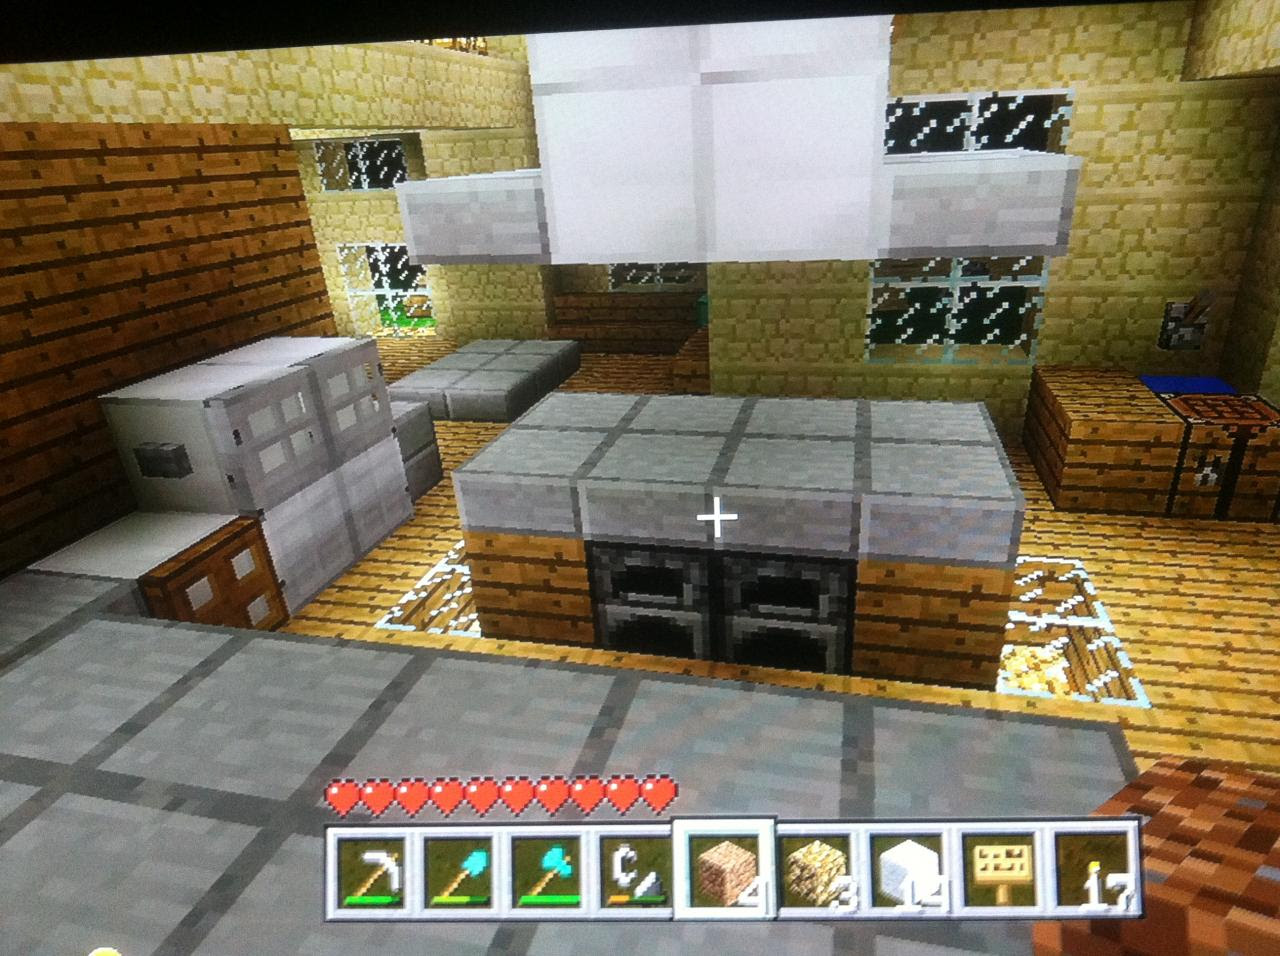 The Kynochs Kitchen Minecraft Xbox 360 Houses Ideas Apps Directories